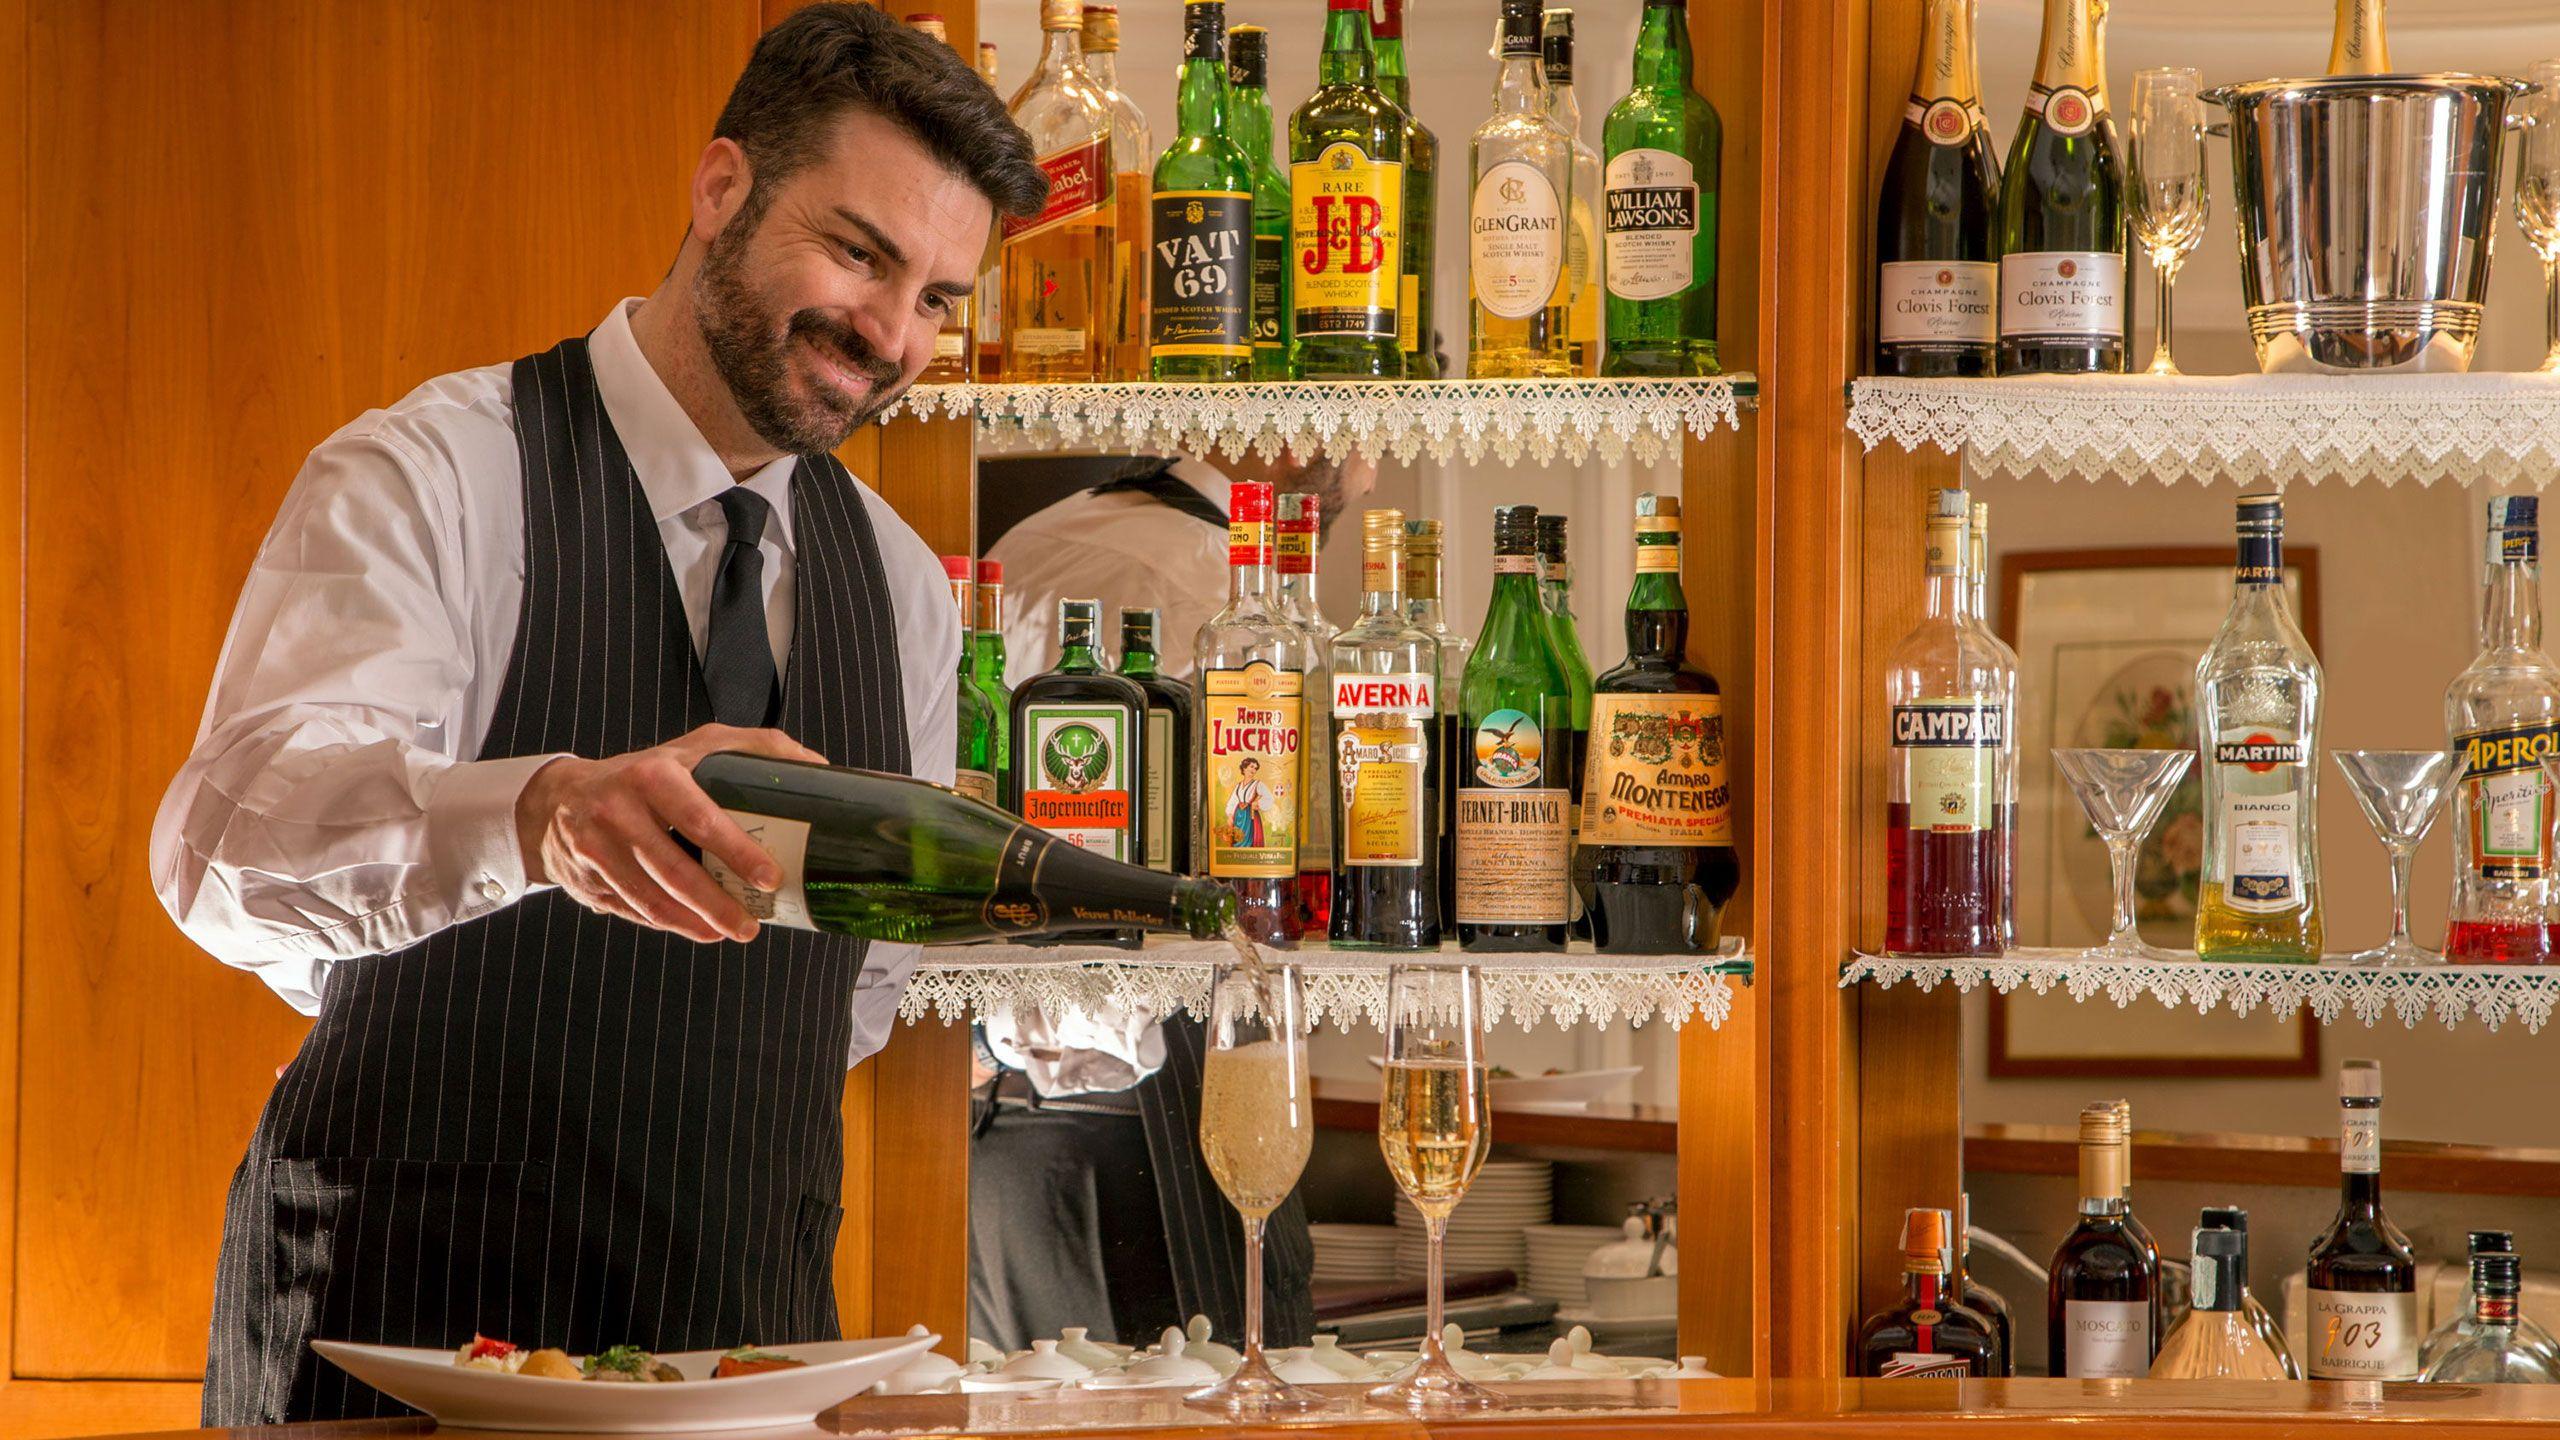 albergo-ottocento-rome-bar-02